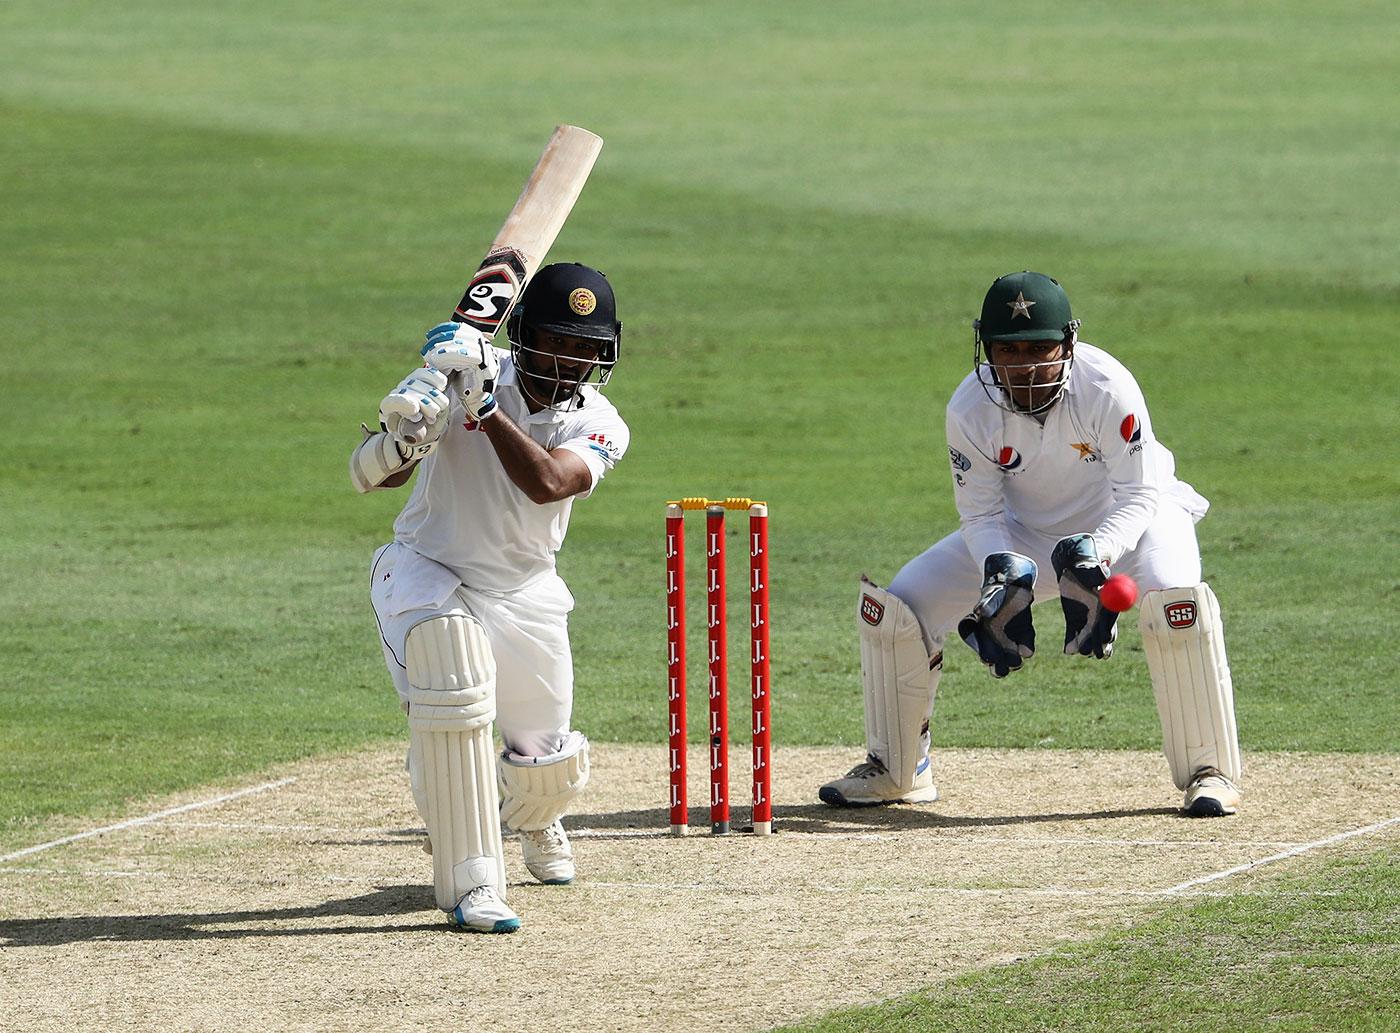 Karunaratne on his way to a career-best 196, against Pakistan in Dubai in October last year